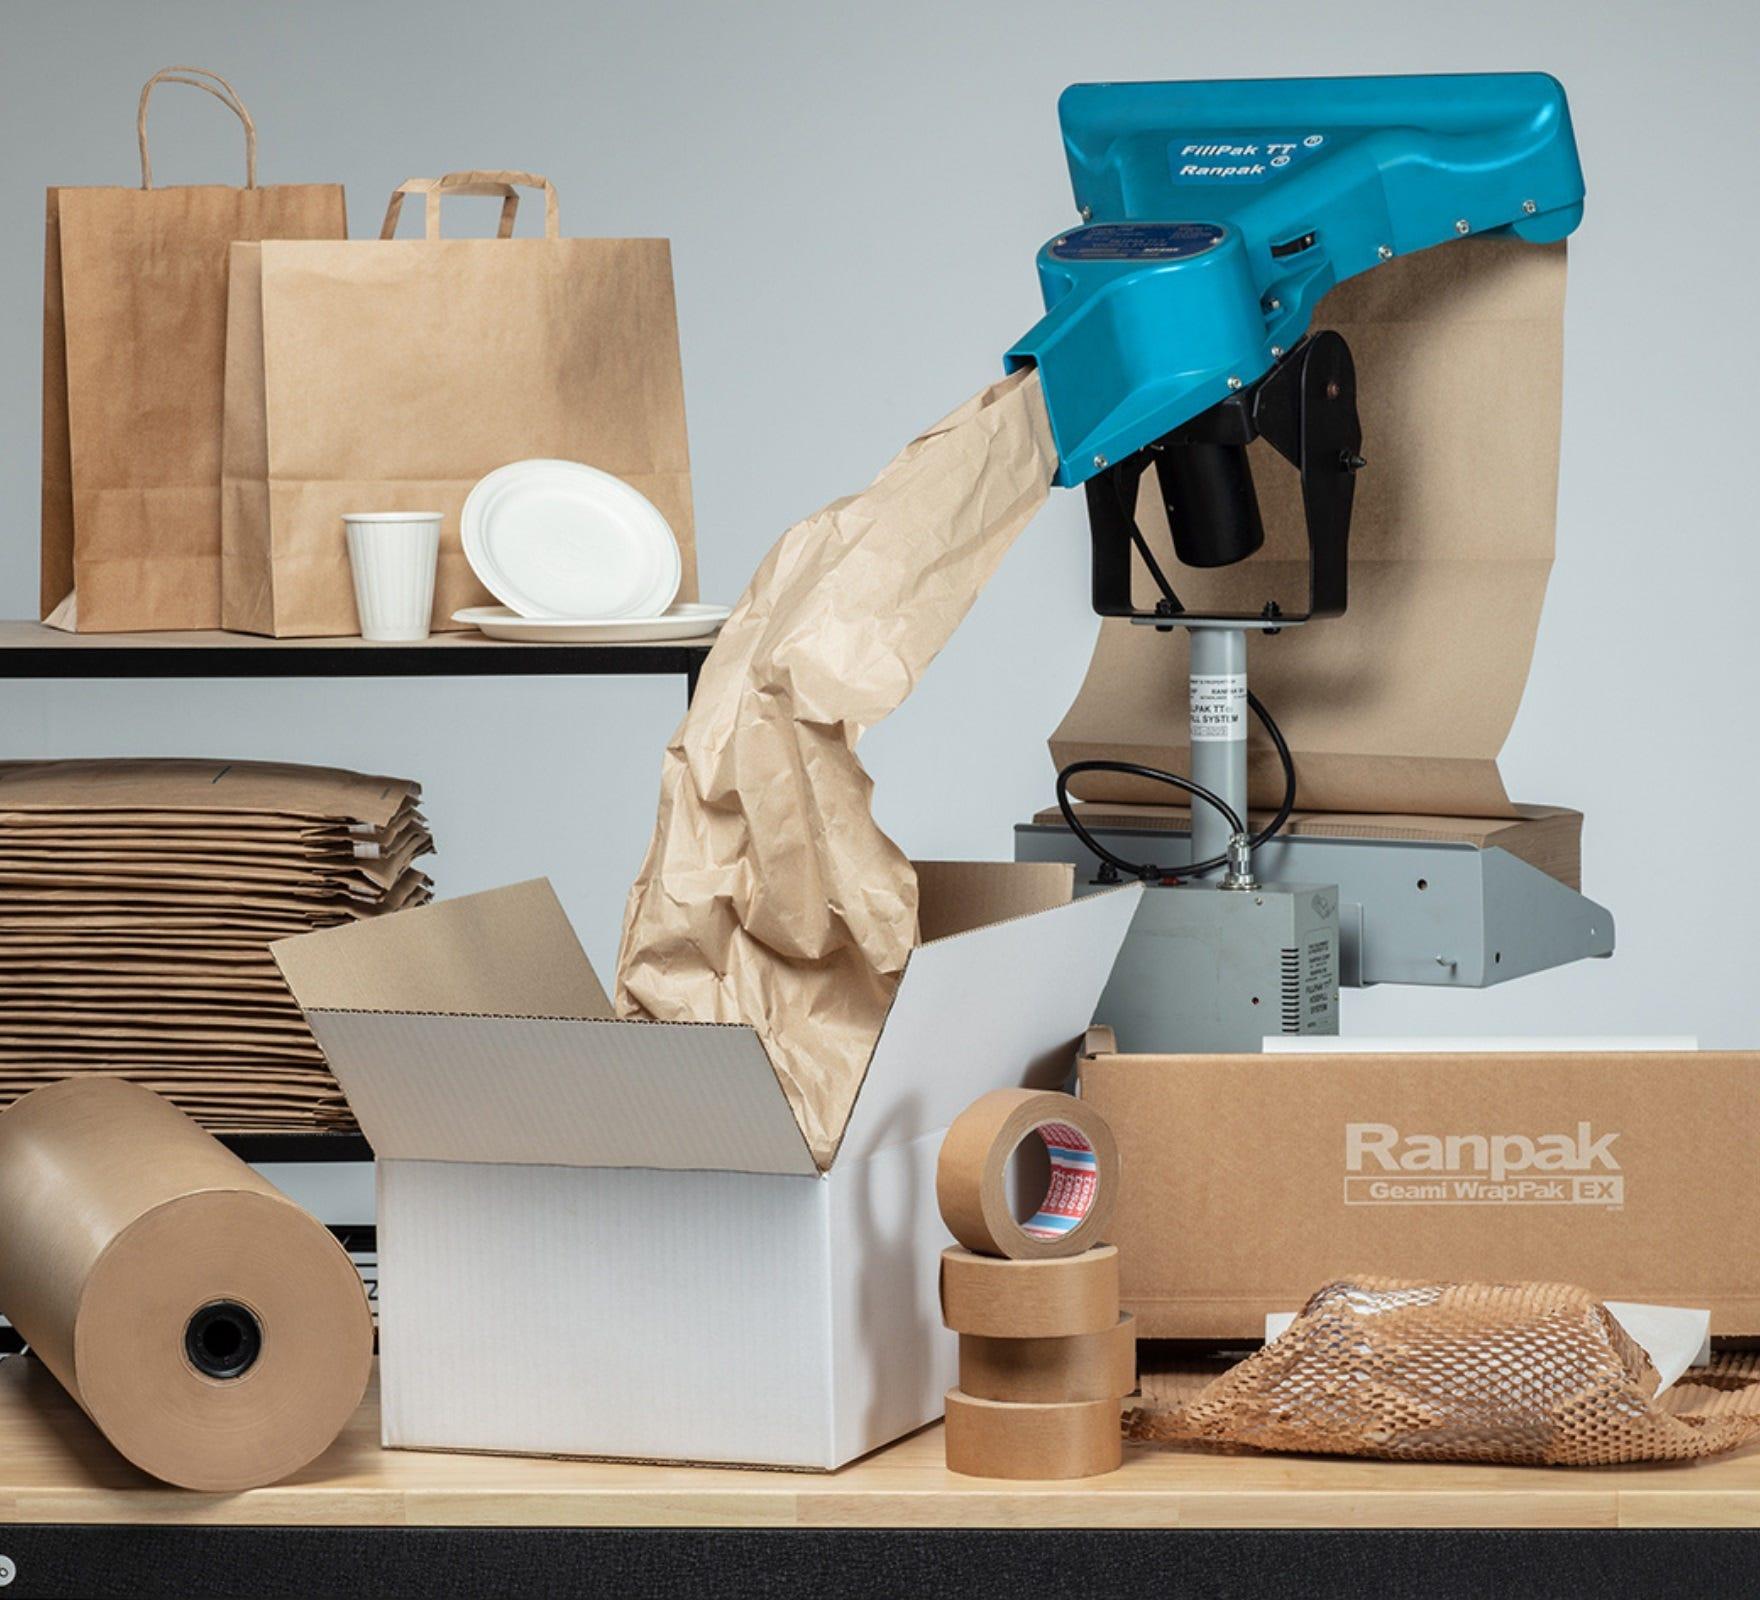 Signet's eco friendly product range